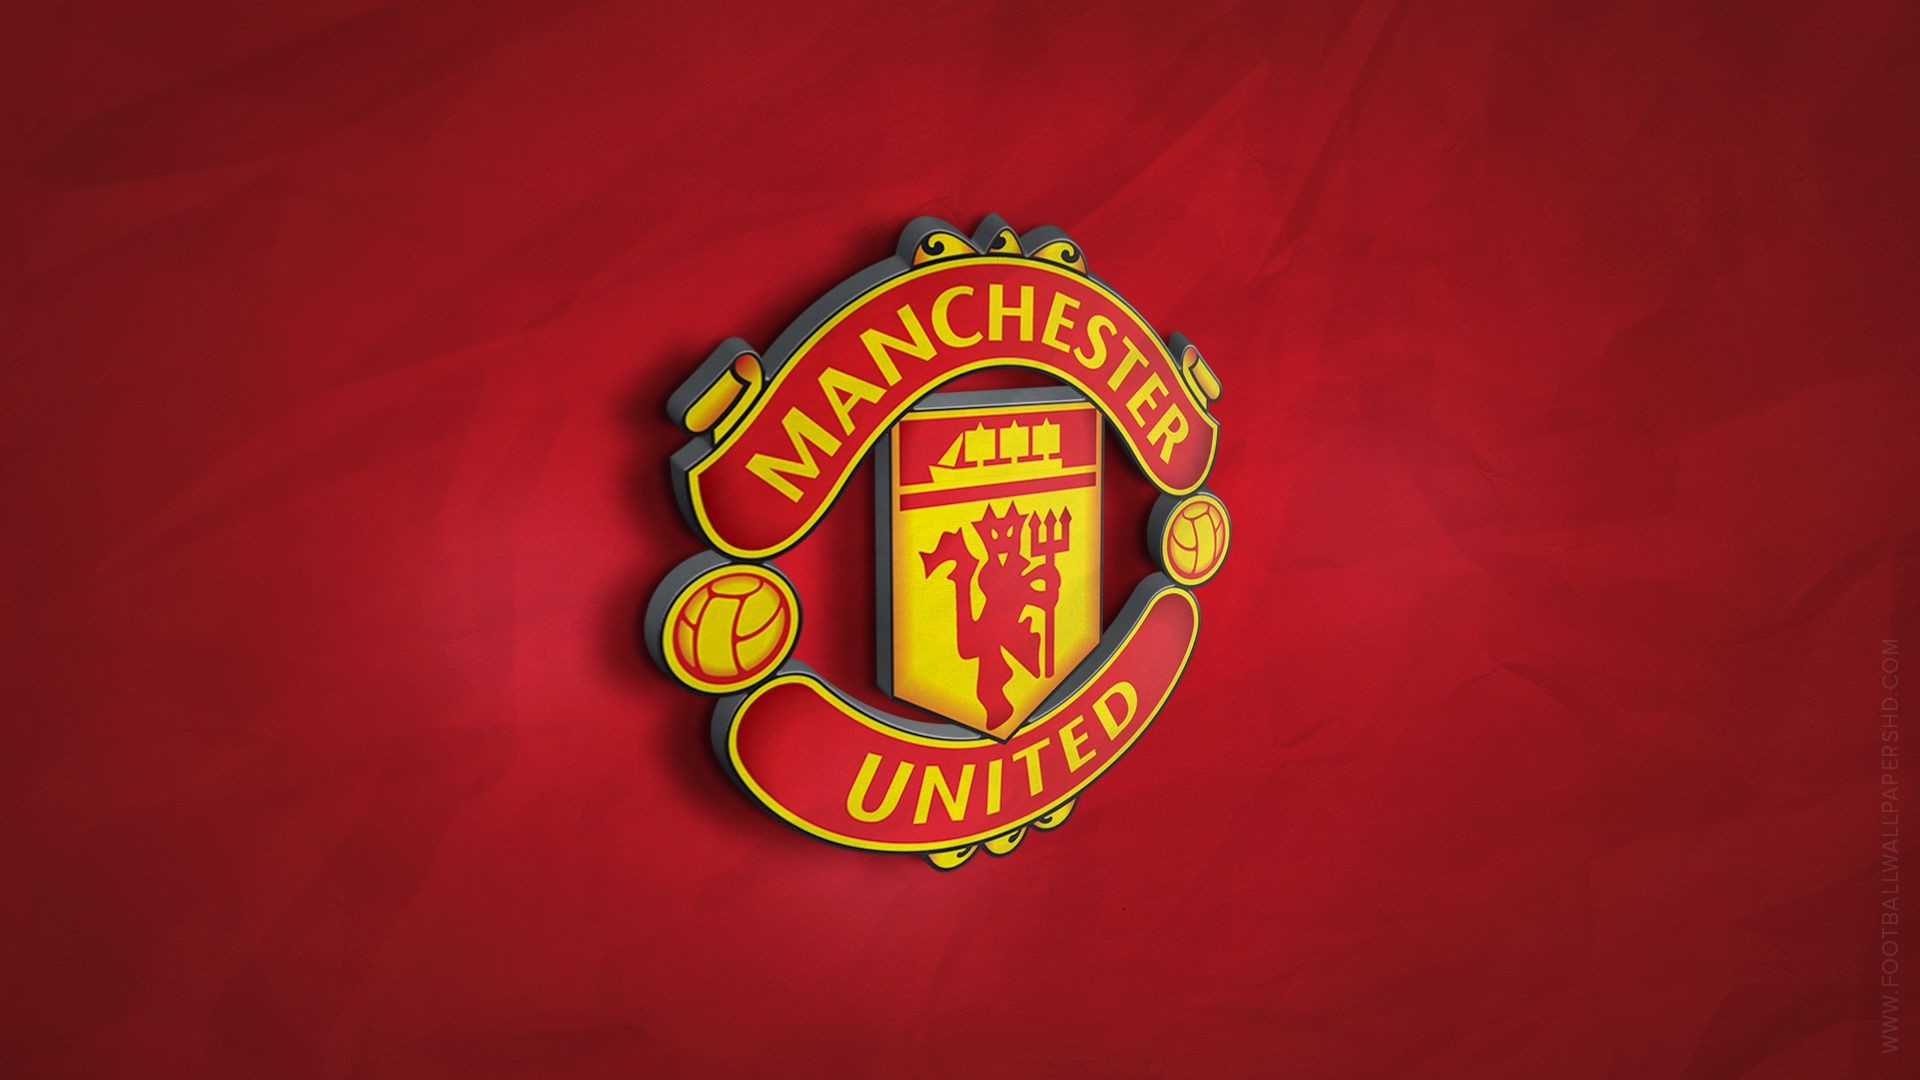 Res: 1920x1080, Manchester United 3D Logo Wallpaper | Football Wallpapers HD